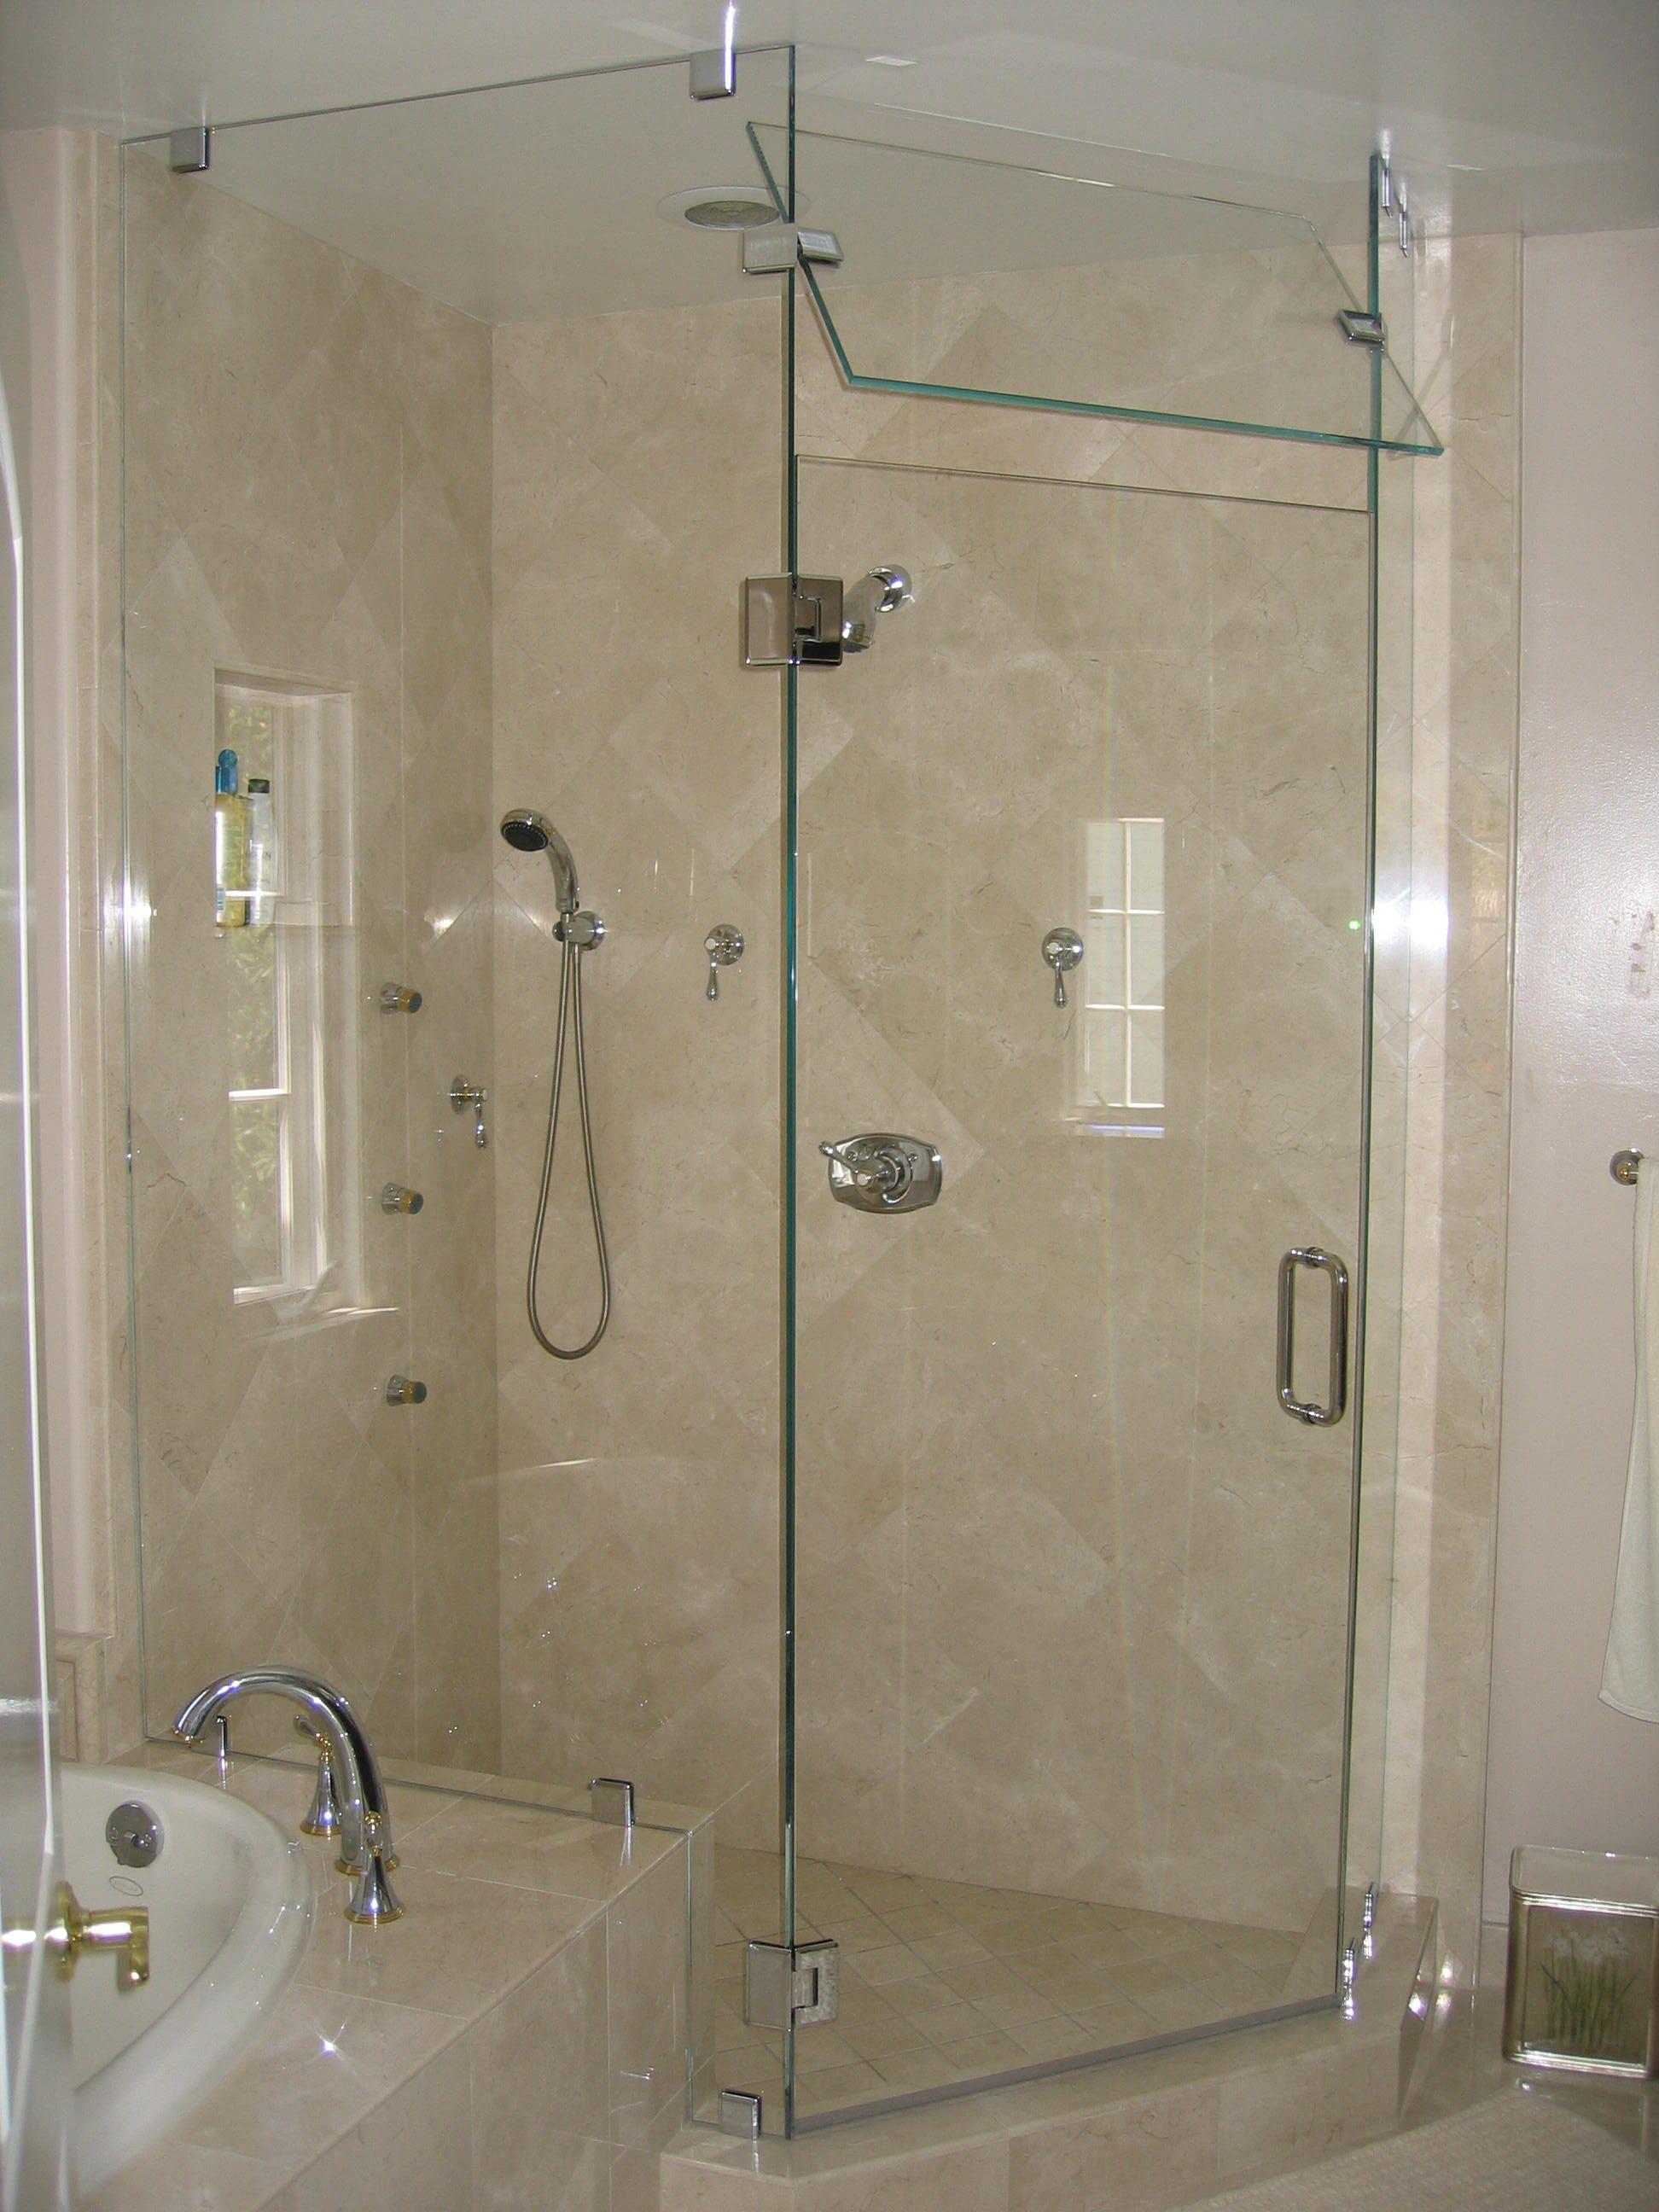 Captiveting Details Shower Glass Panel Desaign For Modern Bathroom With Nice Bathub Color Glass Shower Doors Corner Shower Doors Glass Shower Enclosures